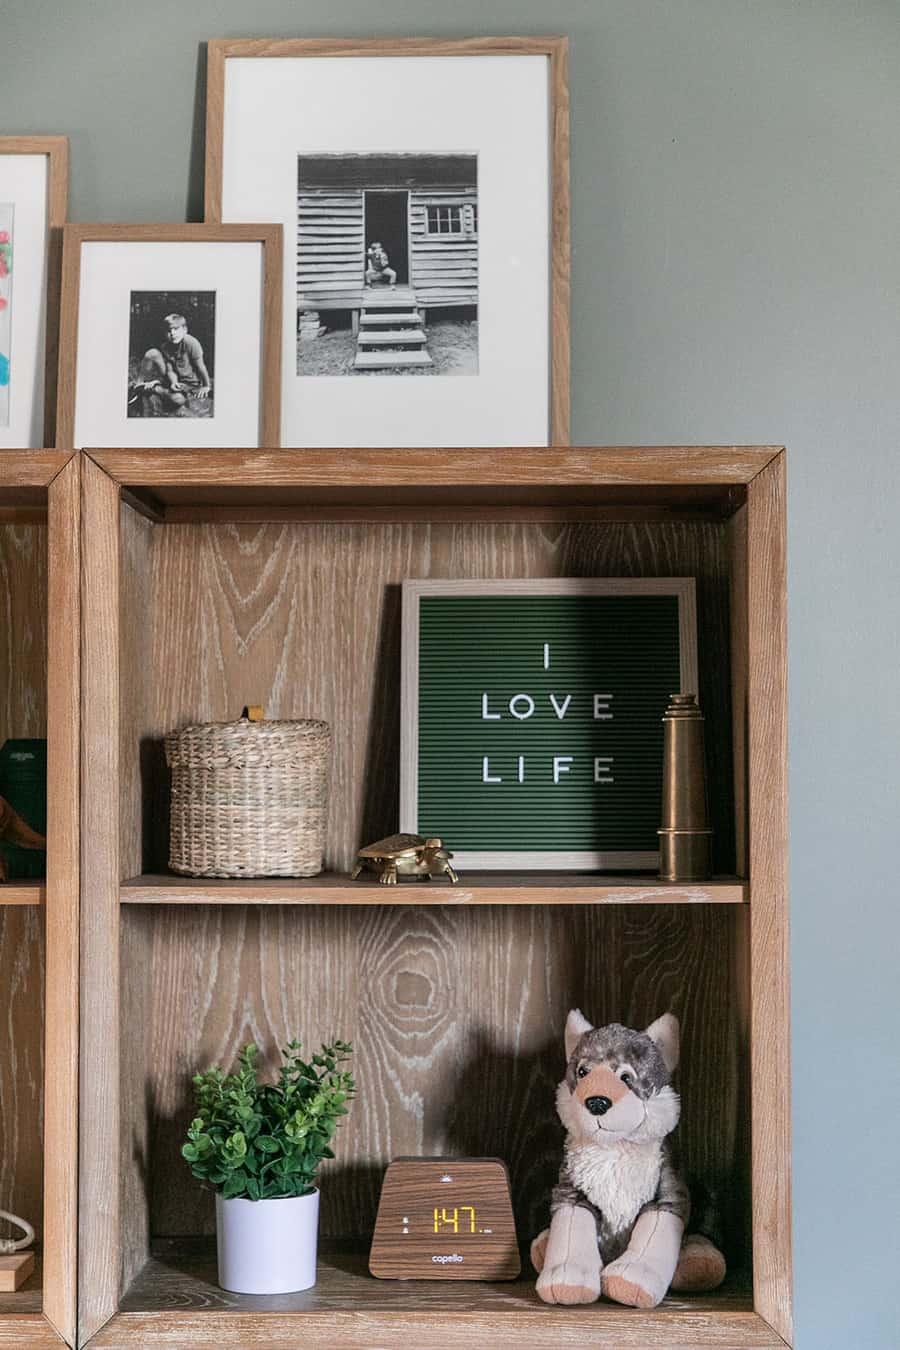 Wood shelf from Pottery Barn